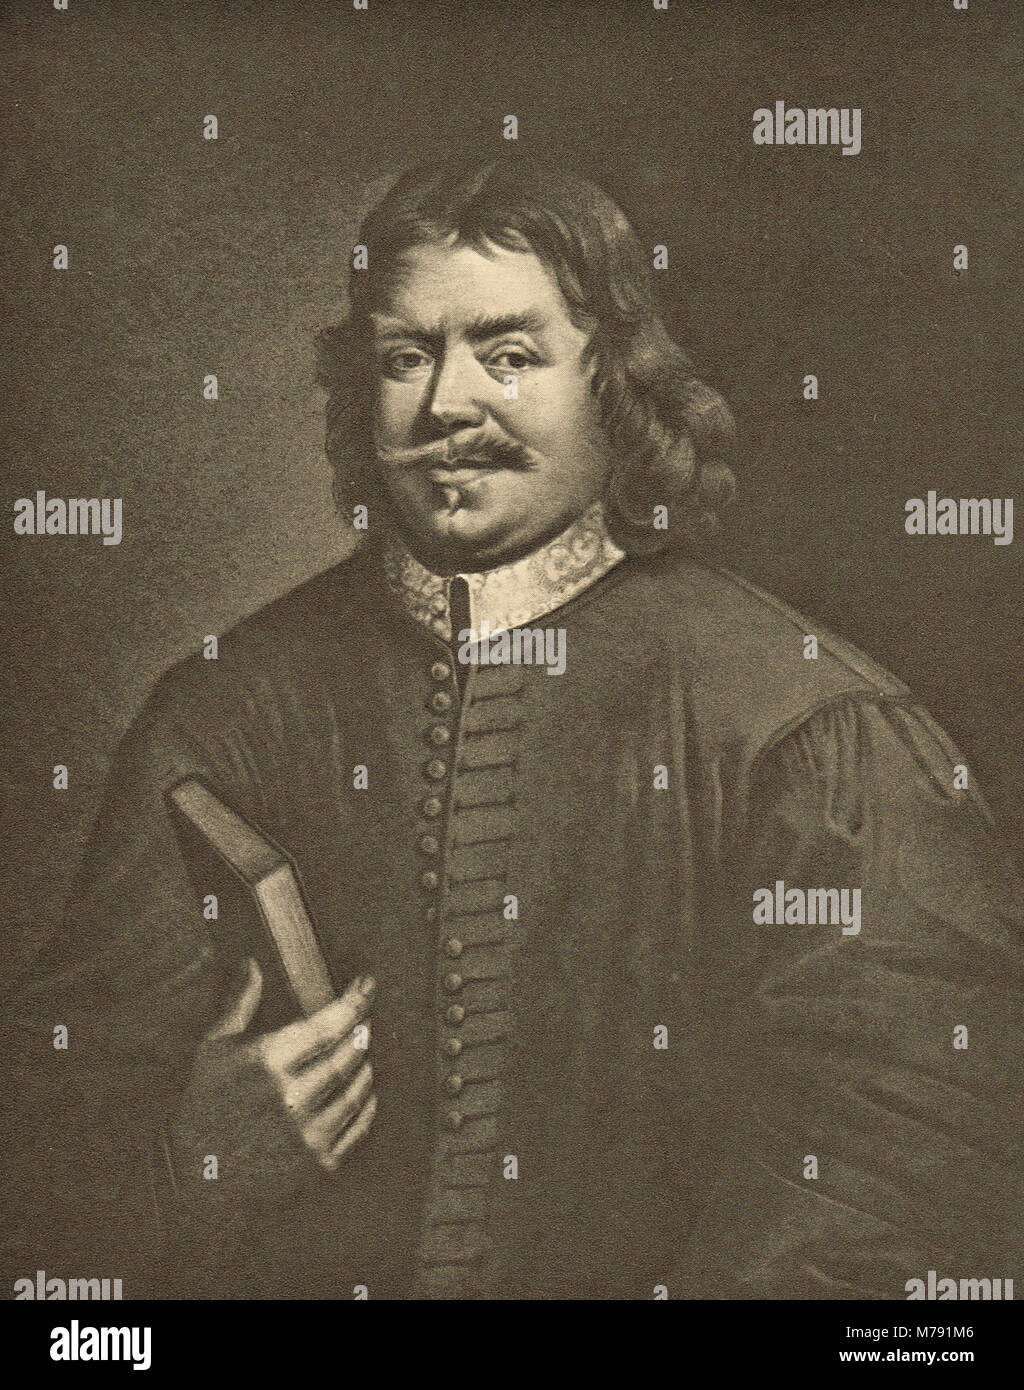 John Bunyan, English writer, Puritan preacher, author of The Pilgrim's Progress - Stock Image